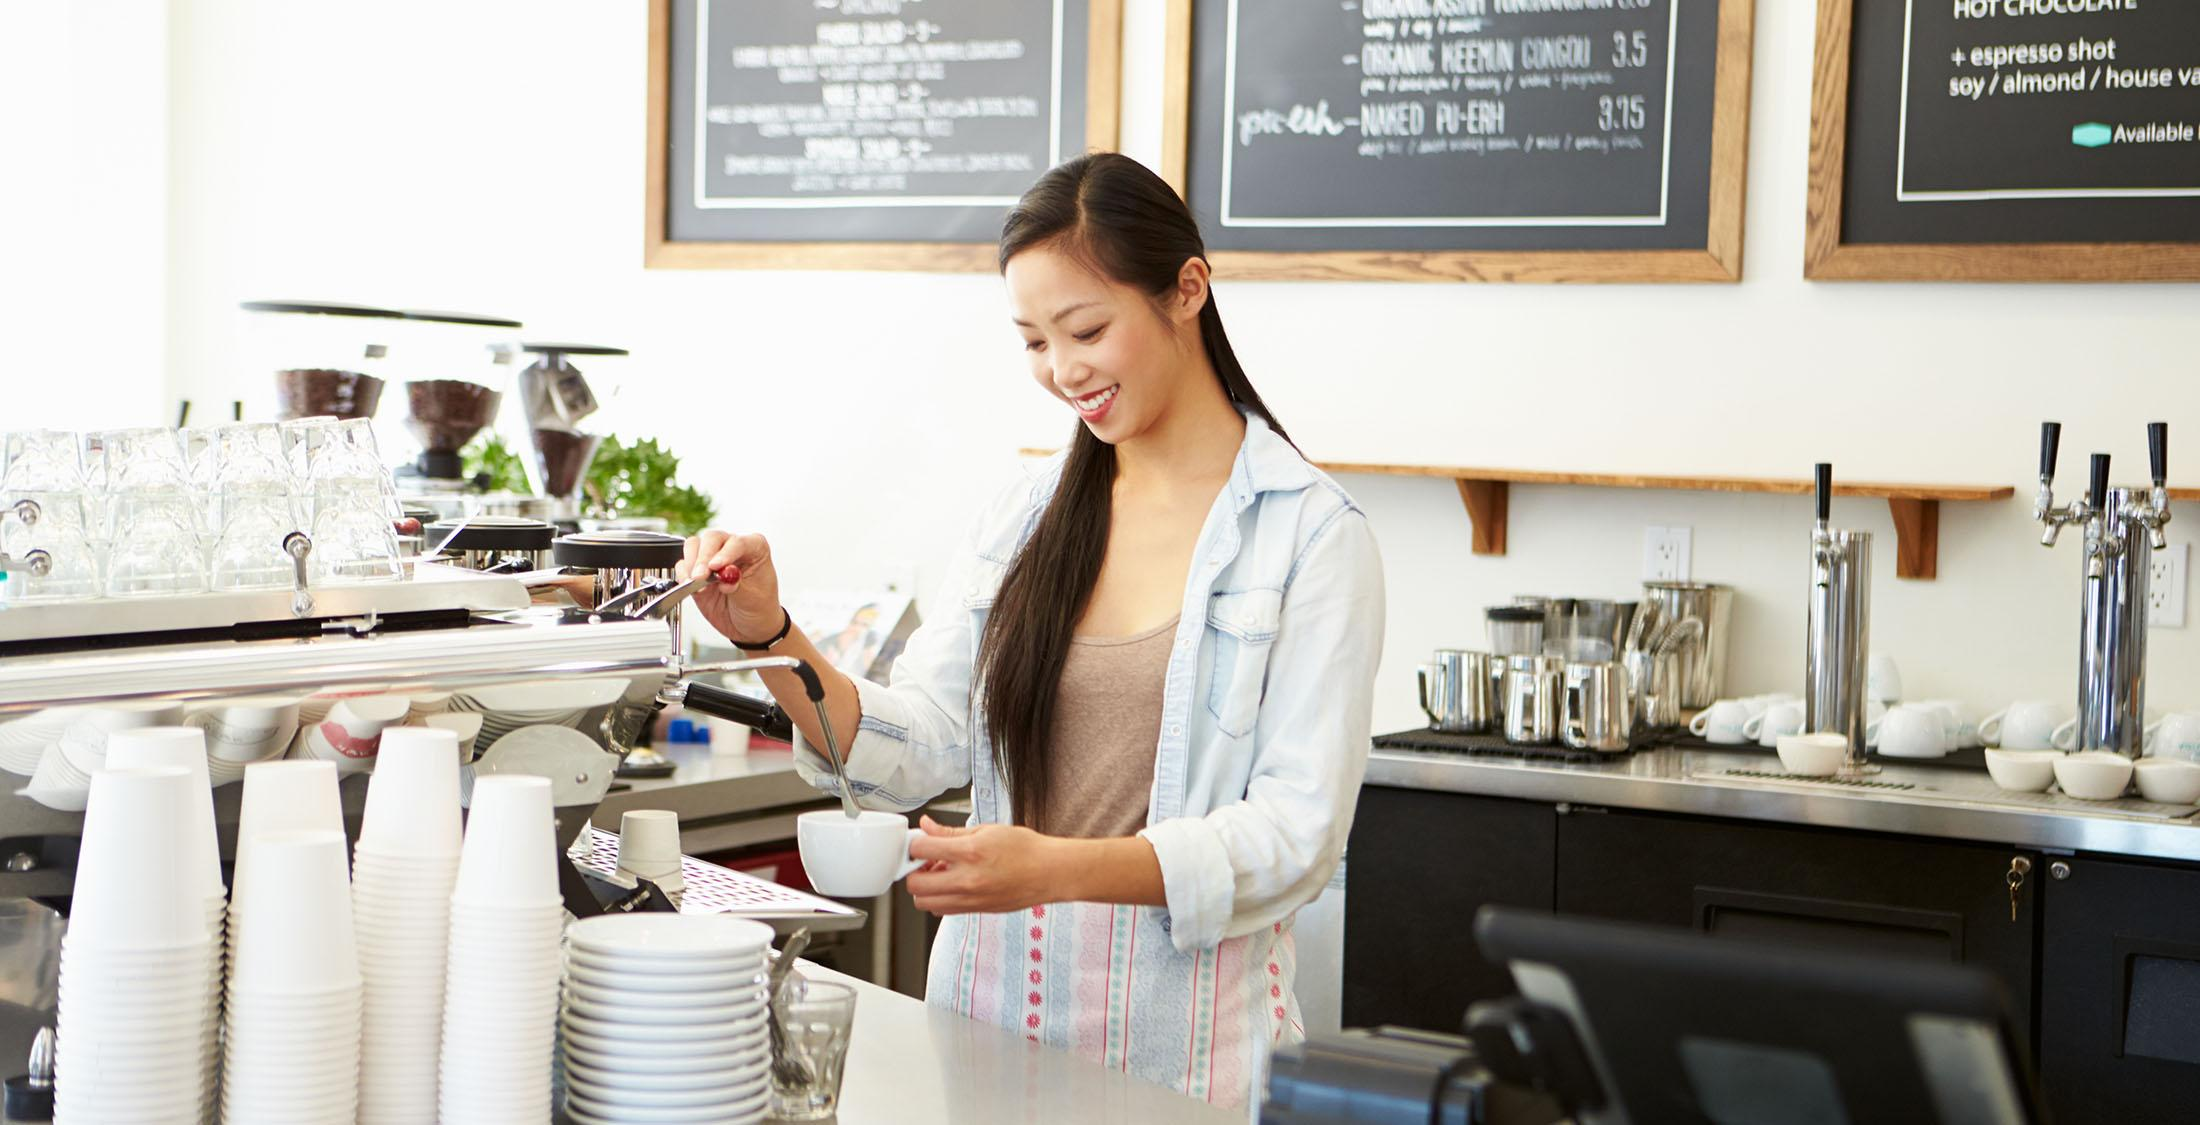 barista making an espresso